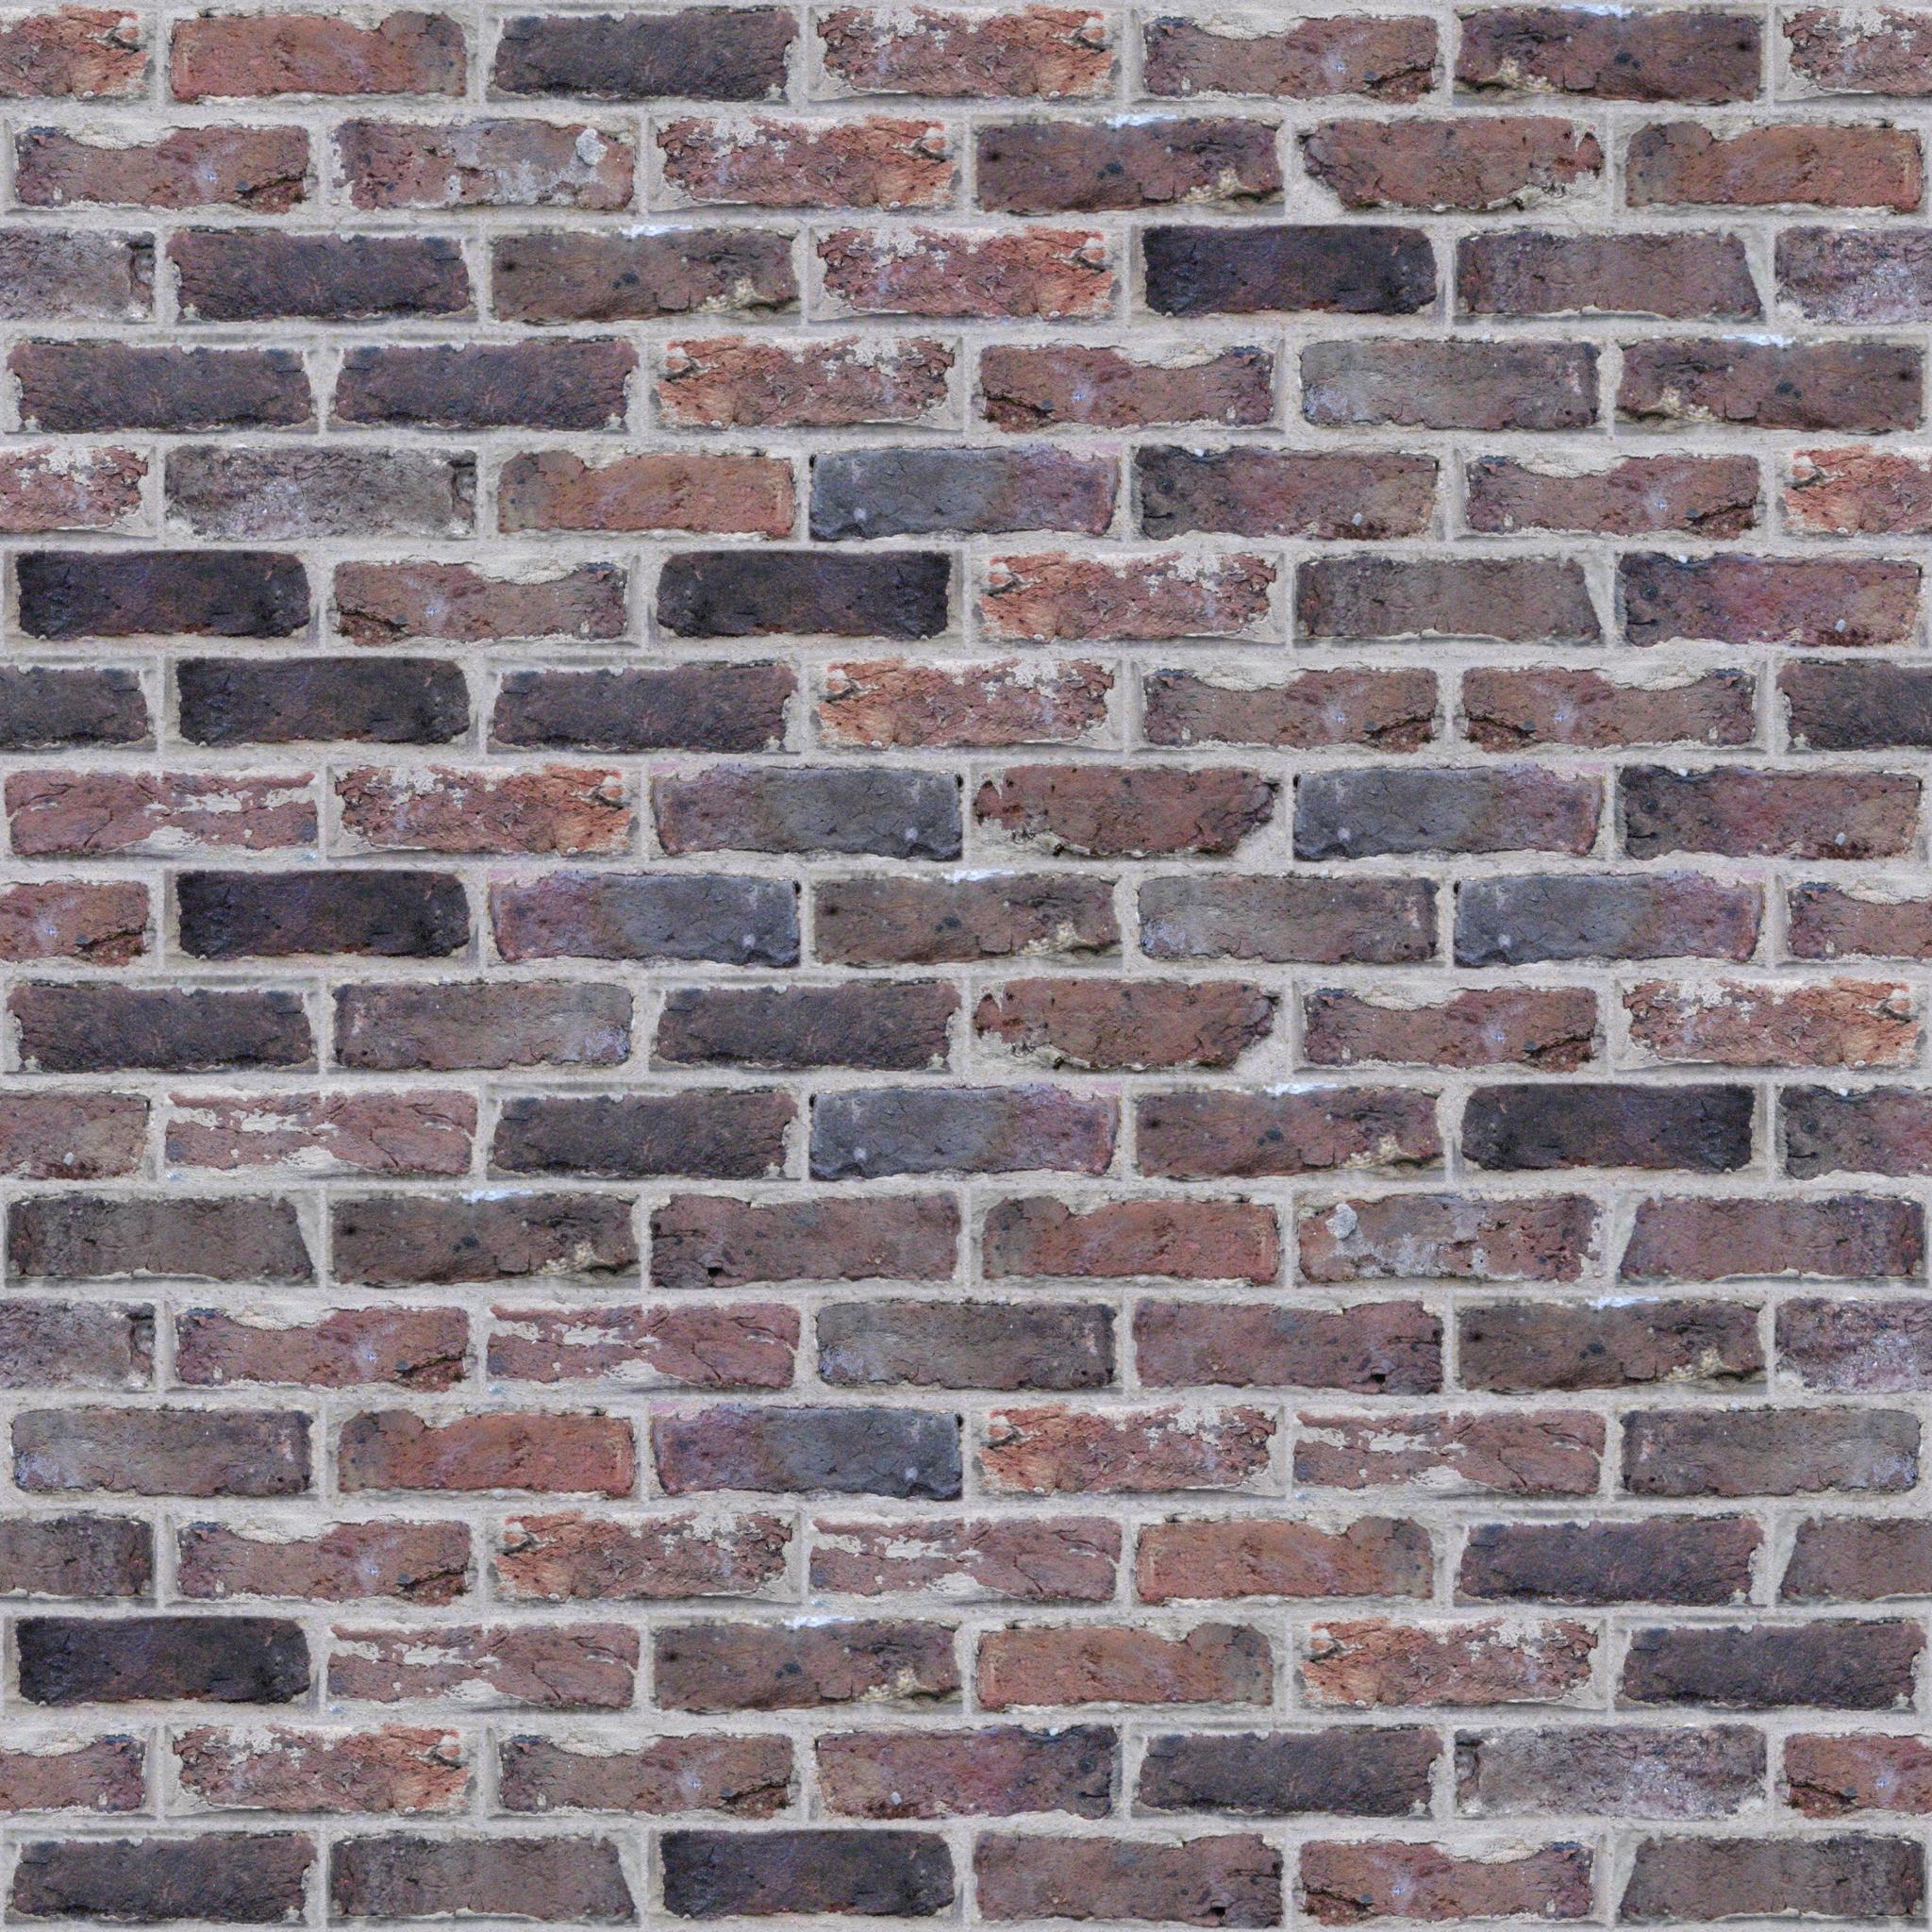 brick wall texture | Material-stone | Pinterest | Wall textures ...